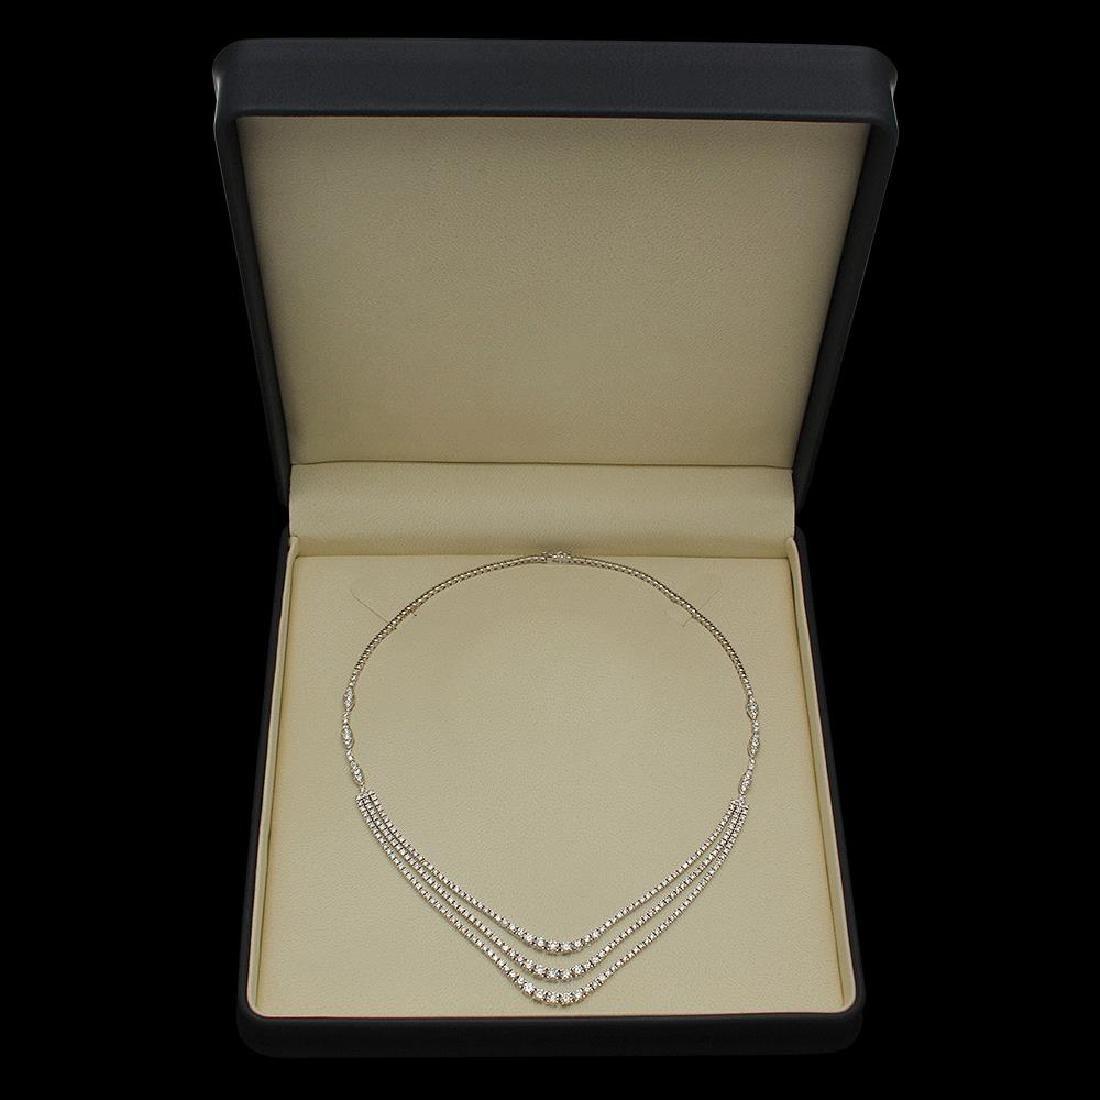 18K Gold 11.20ct Diamond Necklace - 4